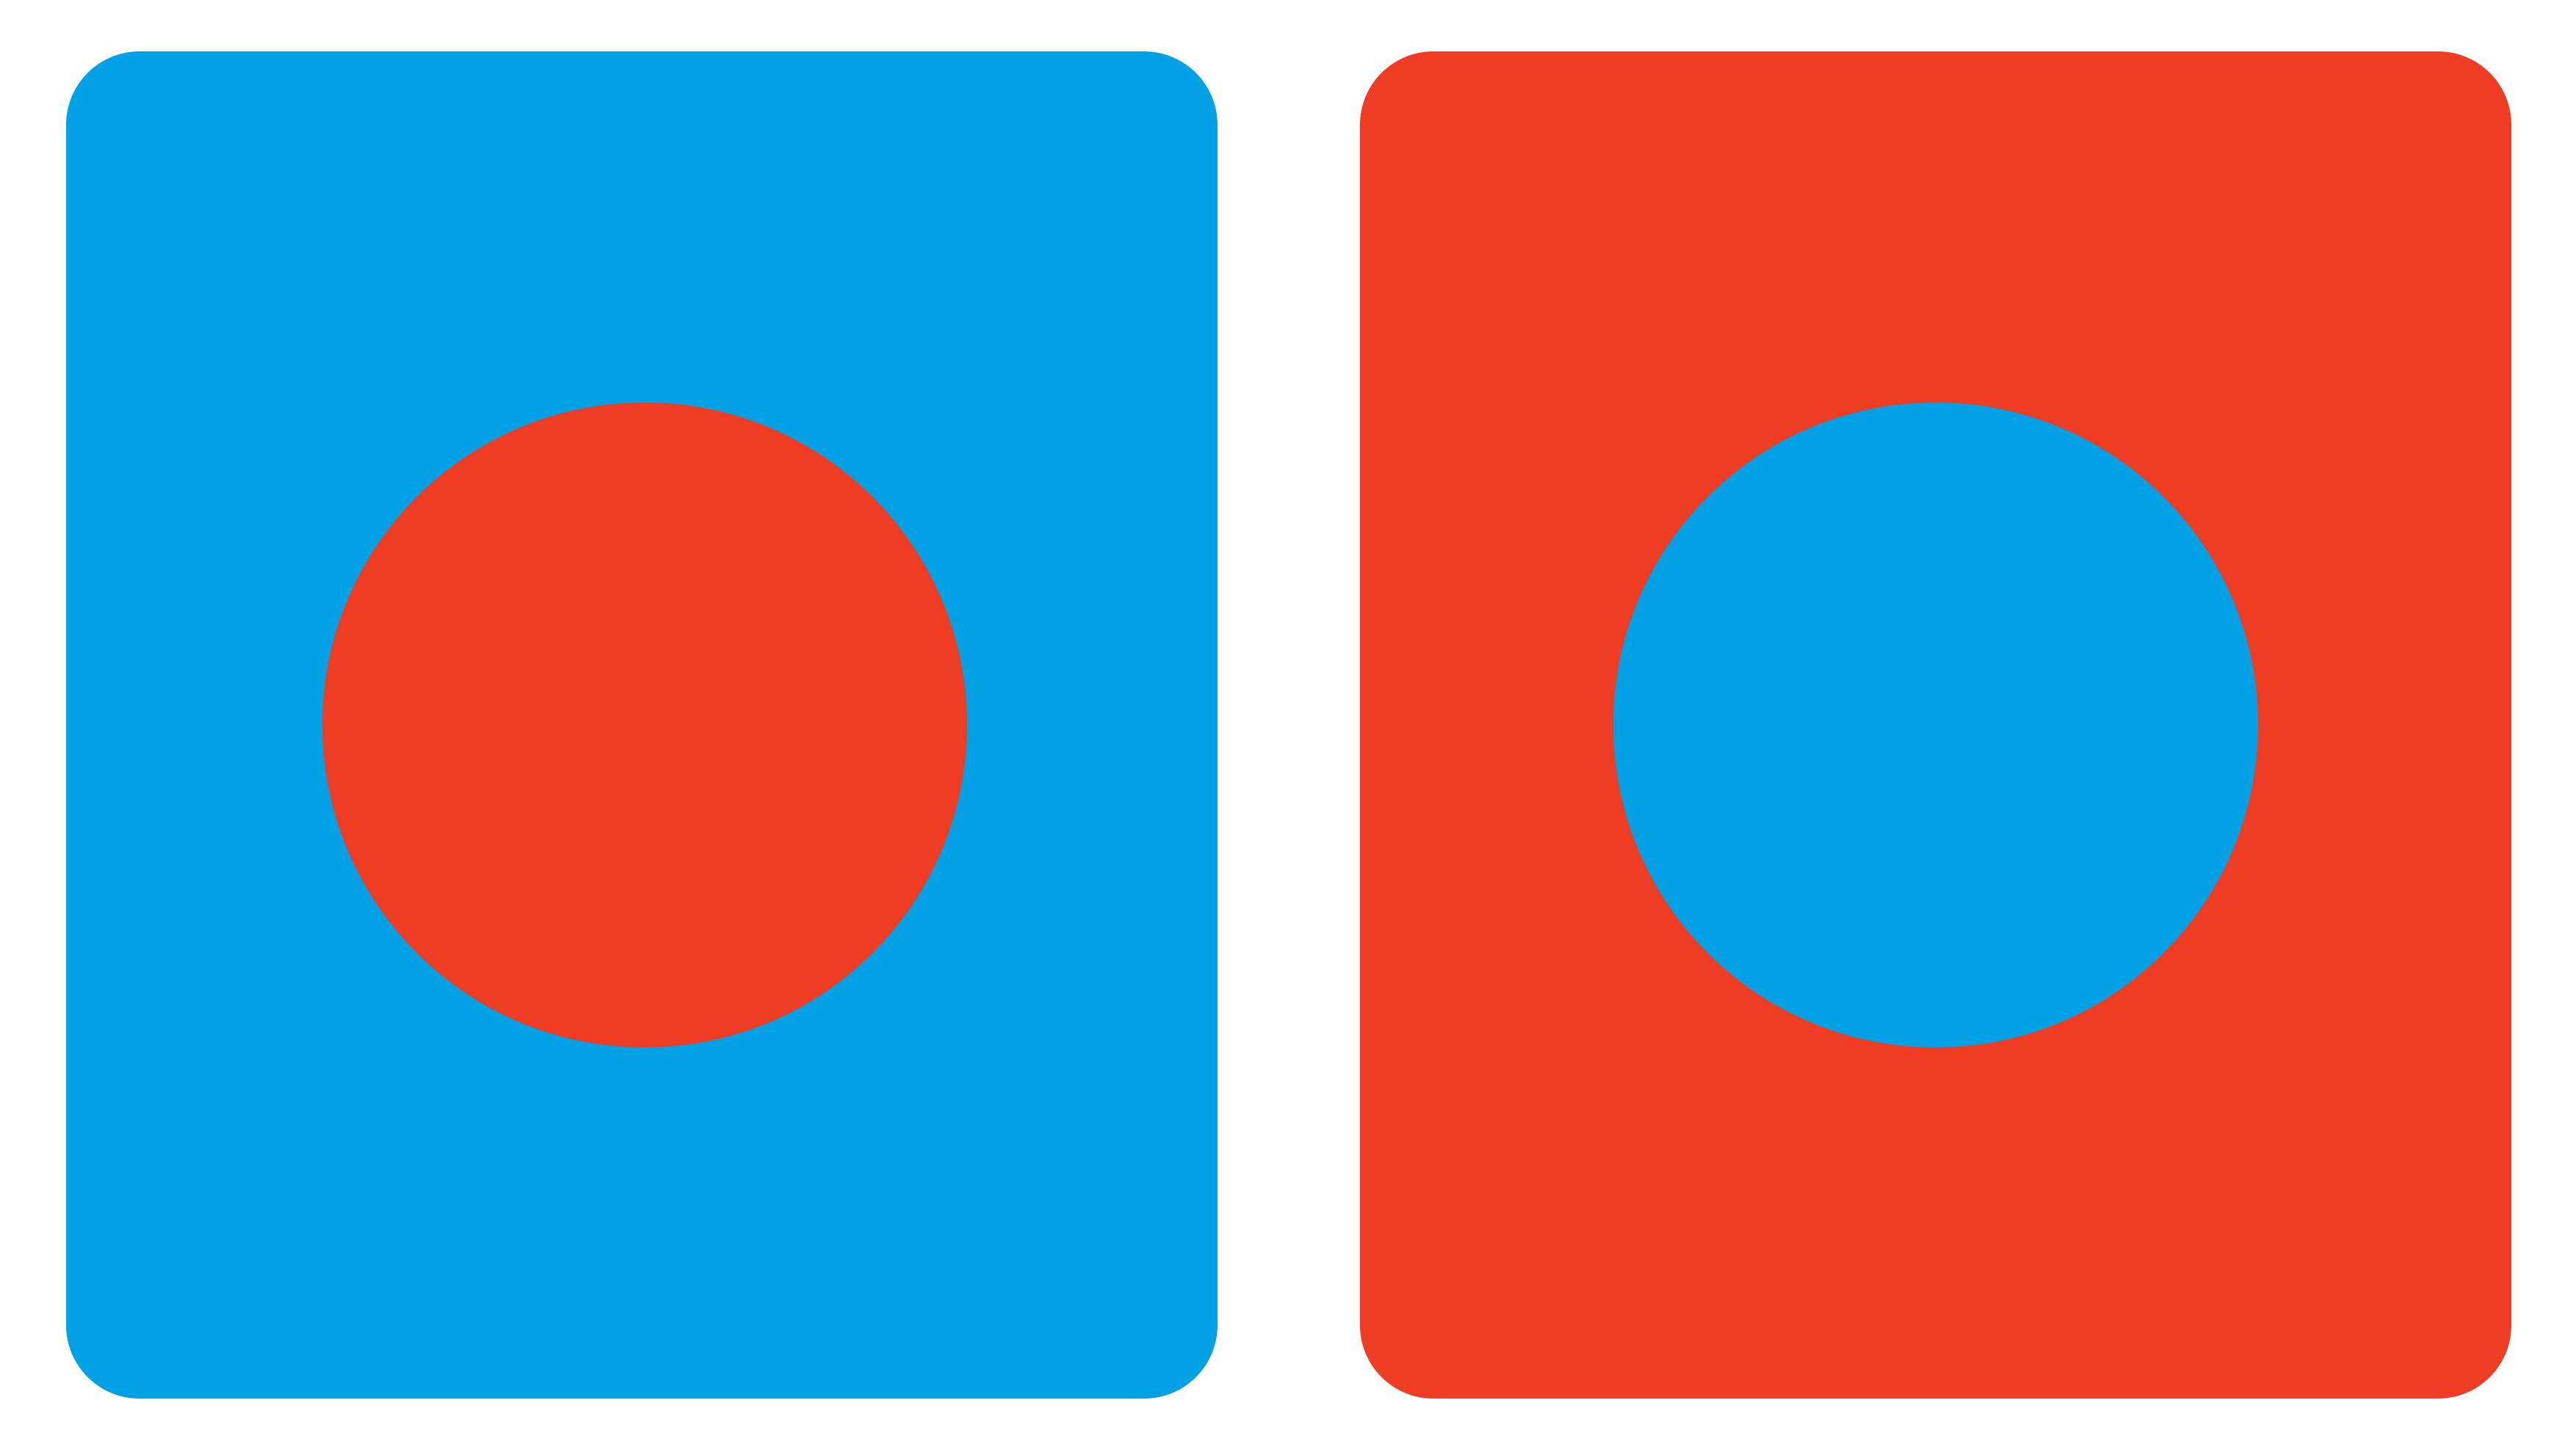 O B Opposite Google Logo Blue Square Tech Logos